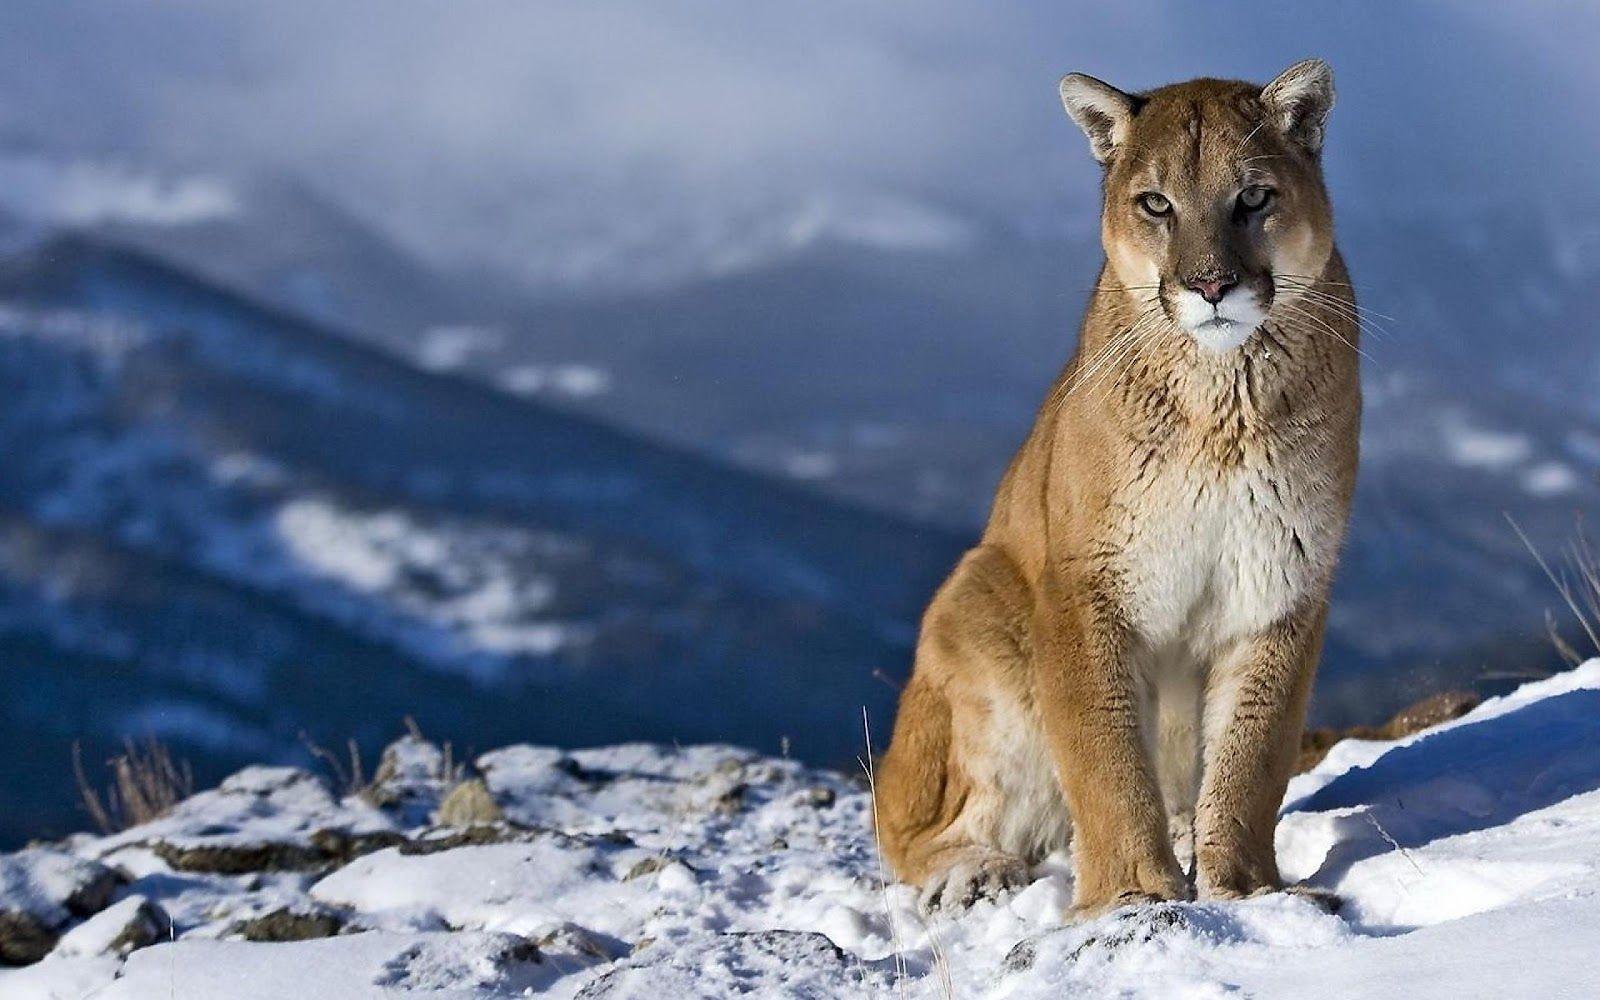 Mountain Lion Wallpaper 퓨마 사자 배경화면 야생 동물